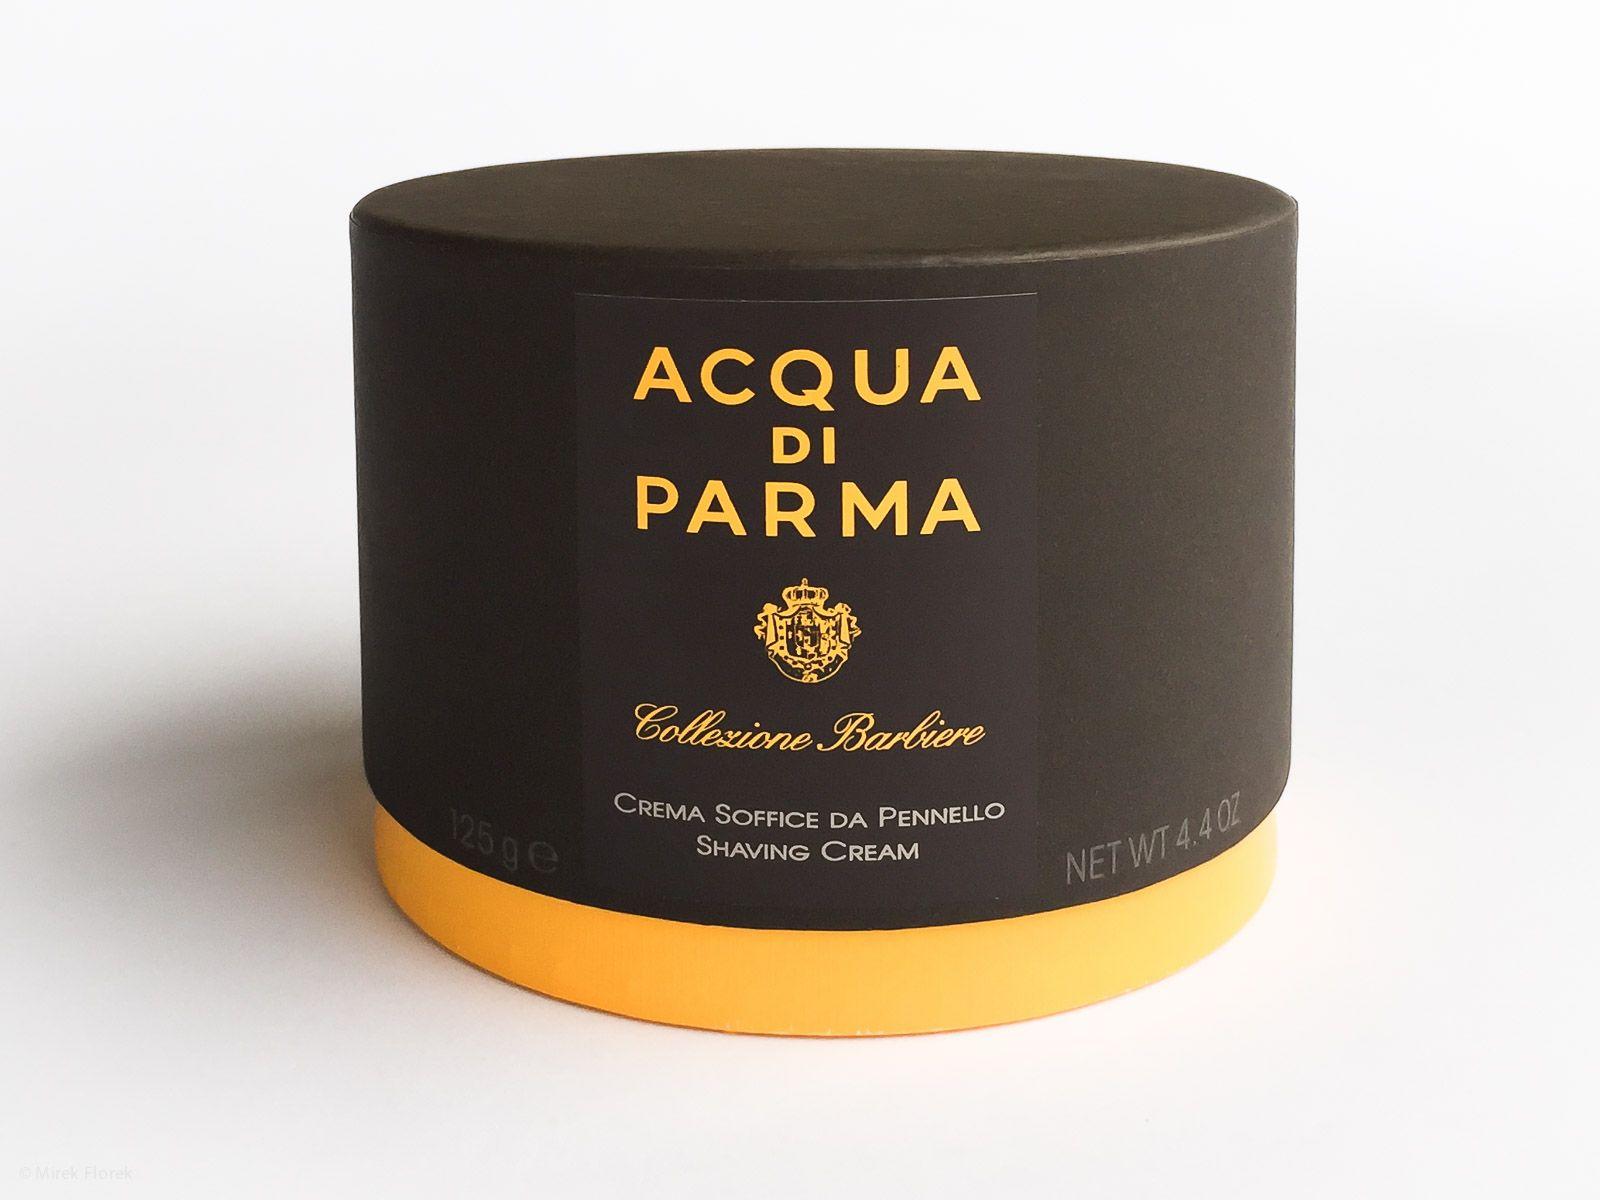 Pudełko z kremem do golenia Acqua di Parma Collezione Barbiere